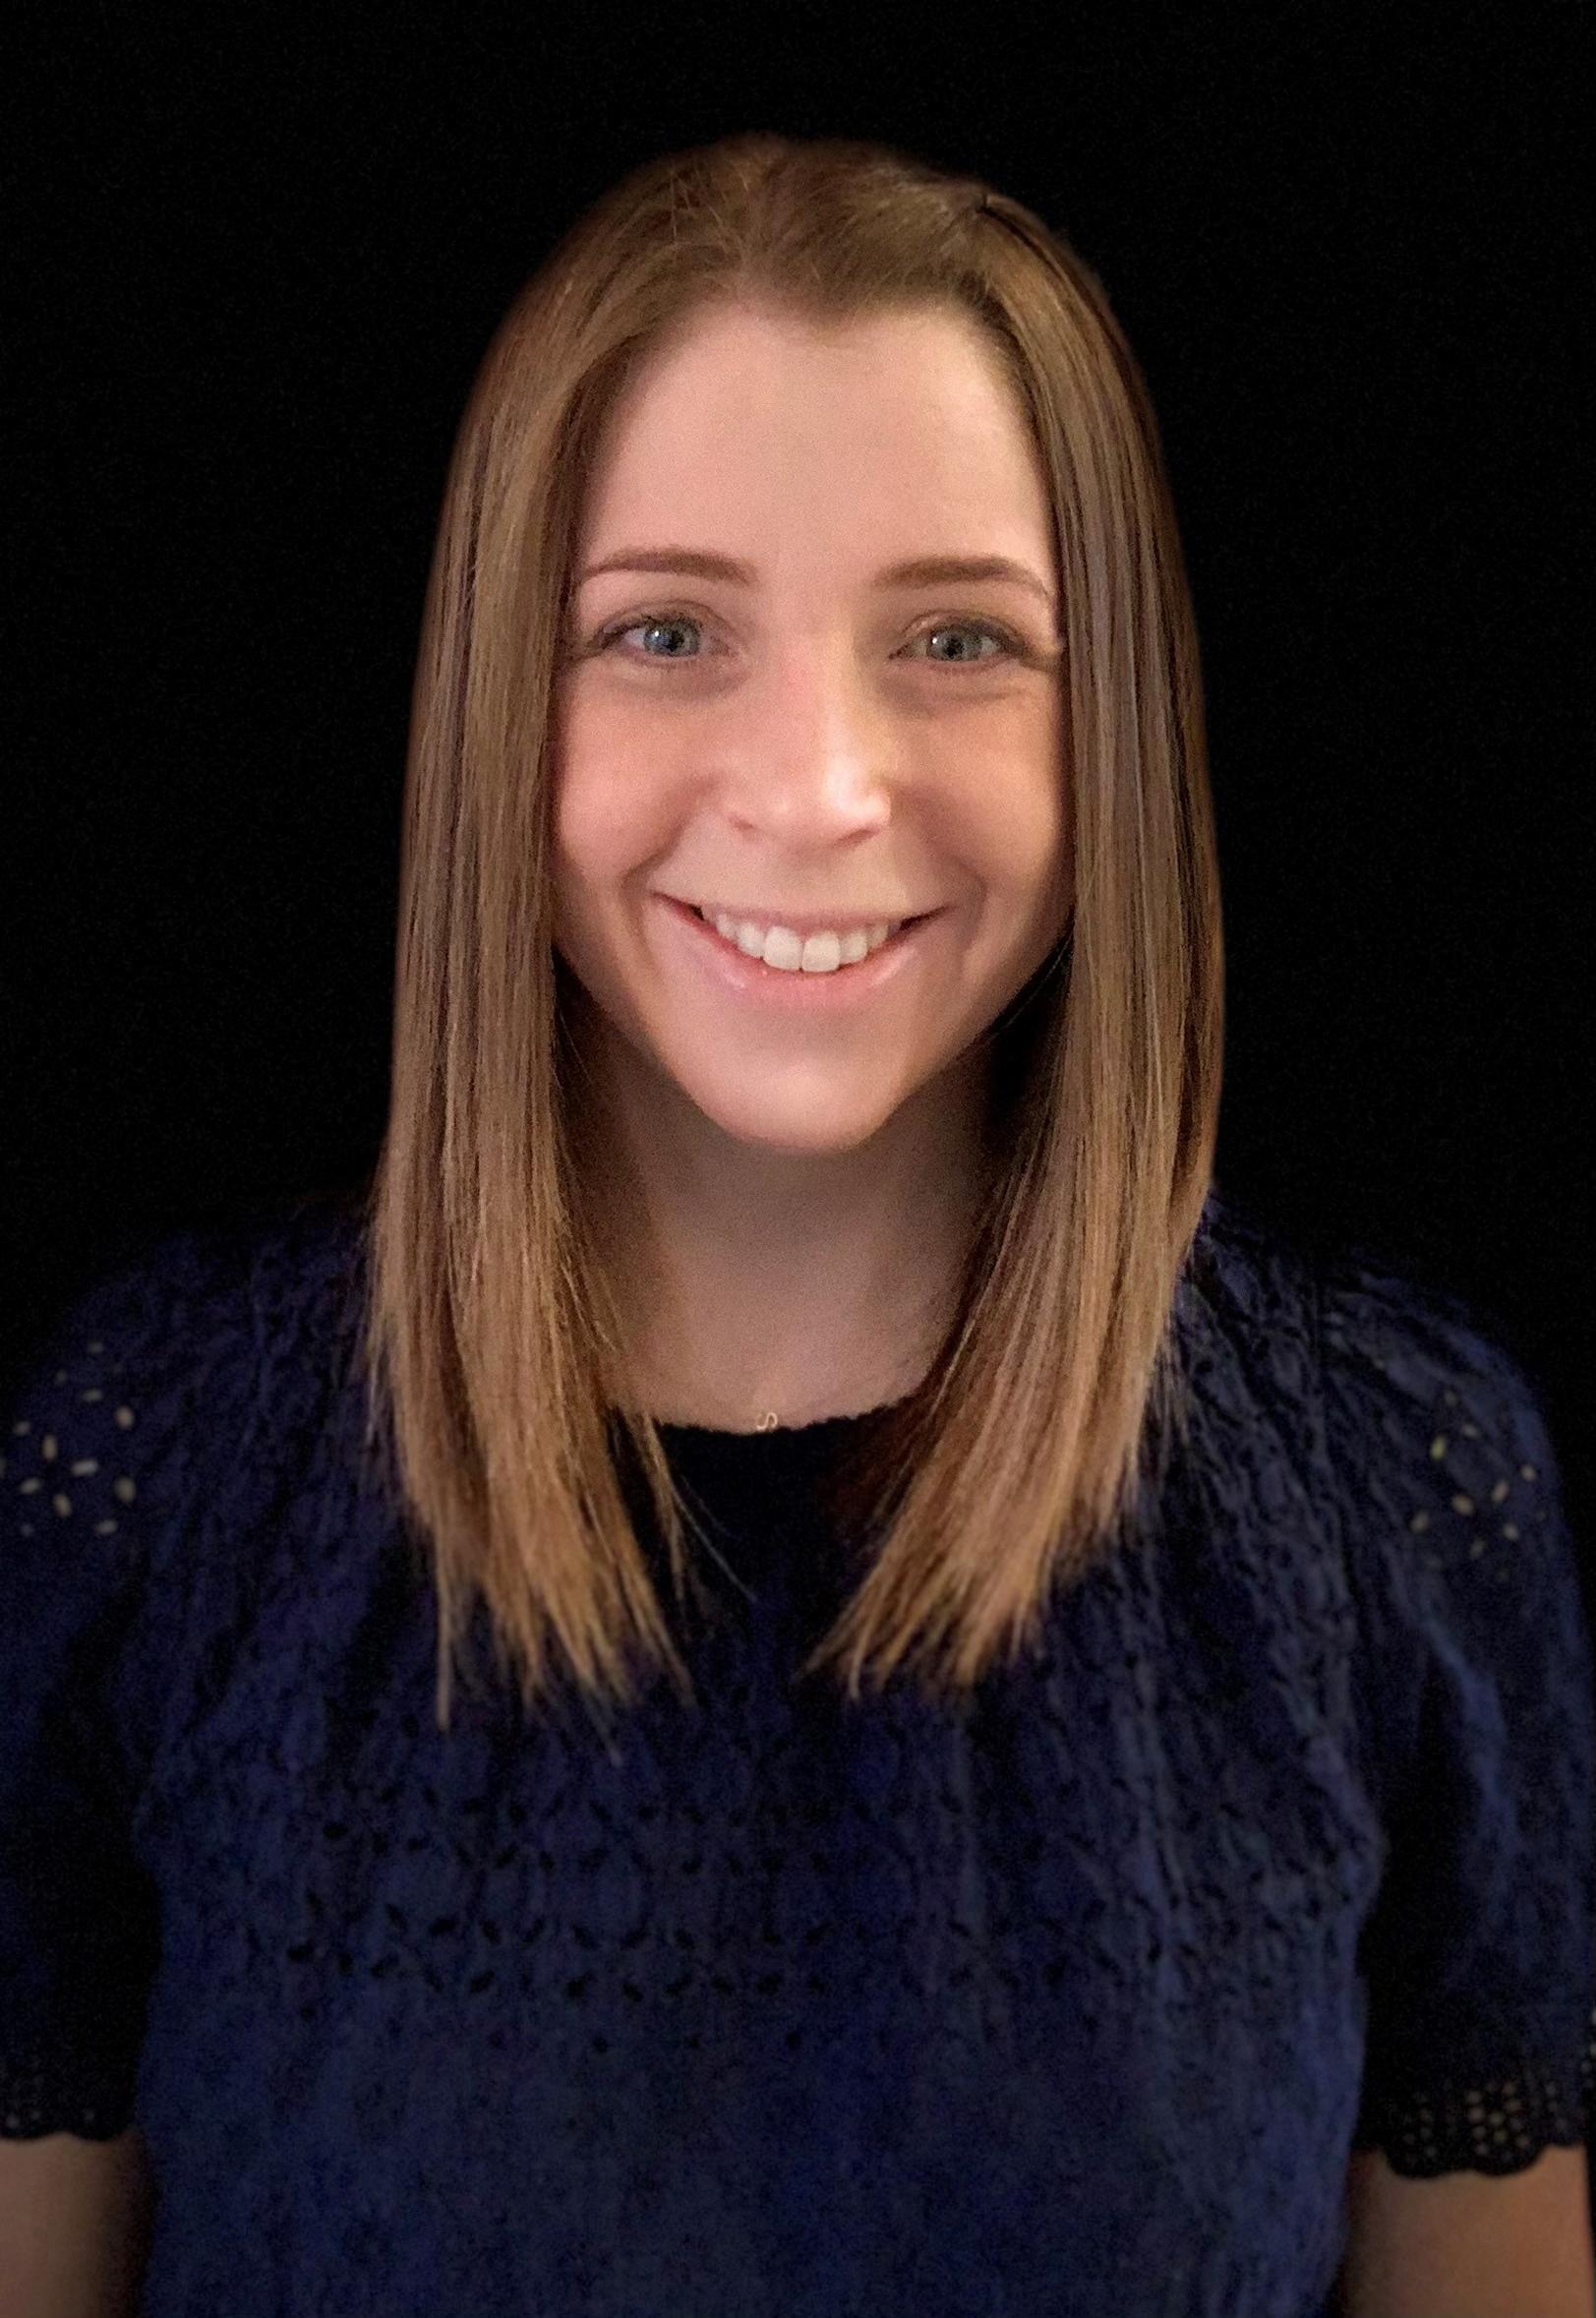 Stephanie Schliftman